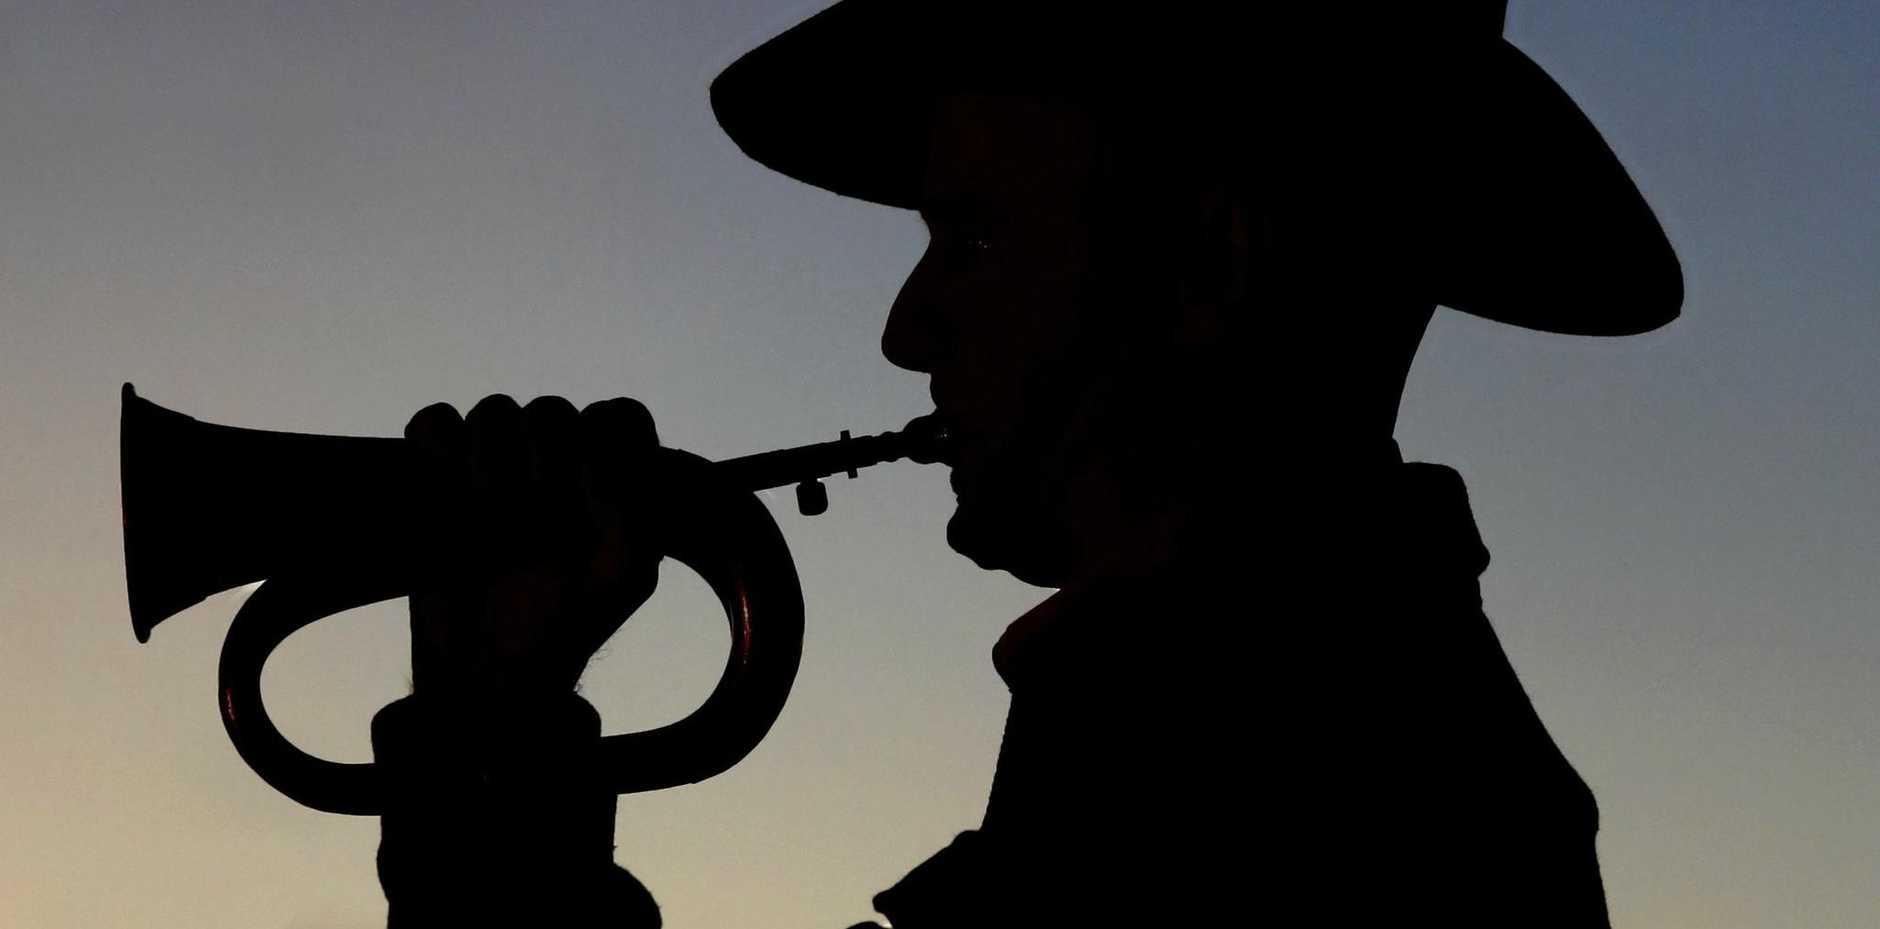 Bugler plays at a dawn service.